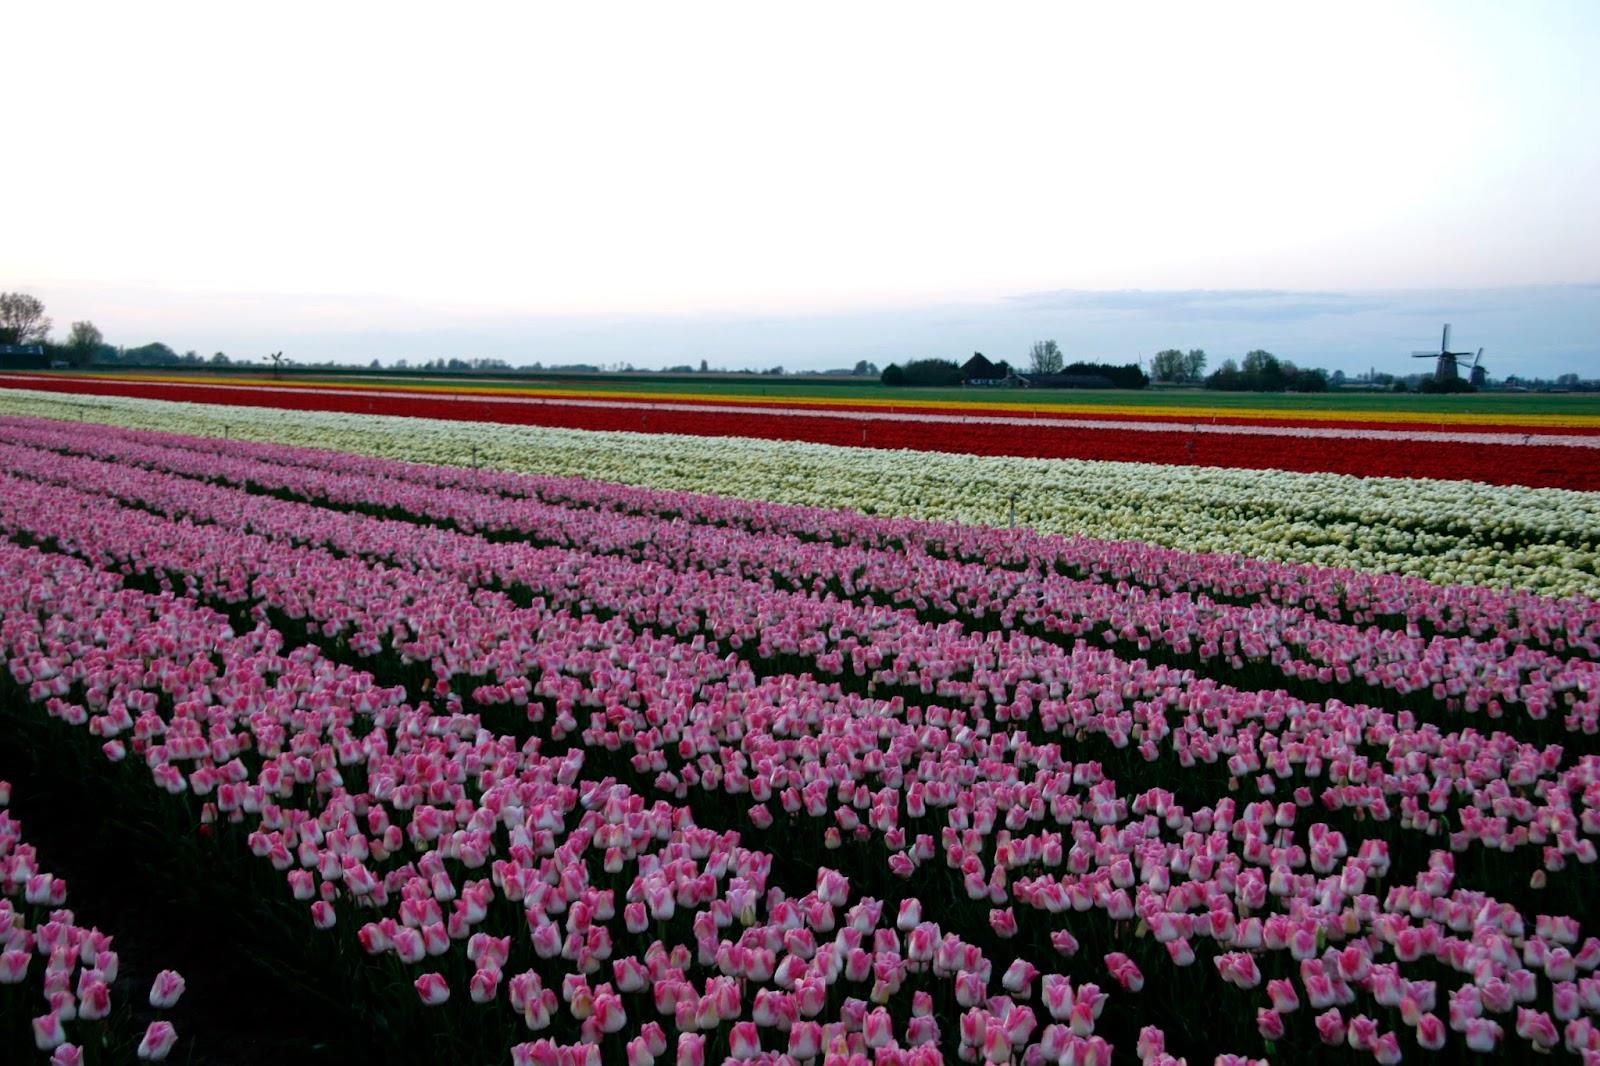 http://vws-flowerbulbs.nl/flowerbulbs/tulip/